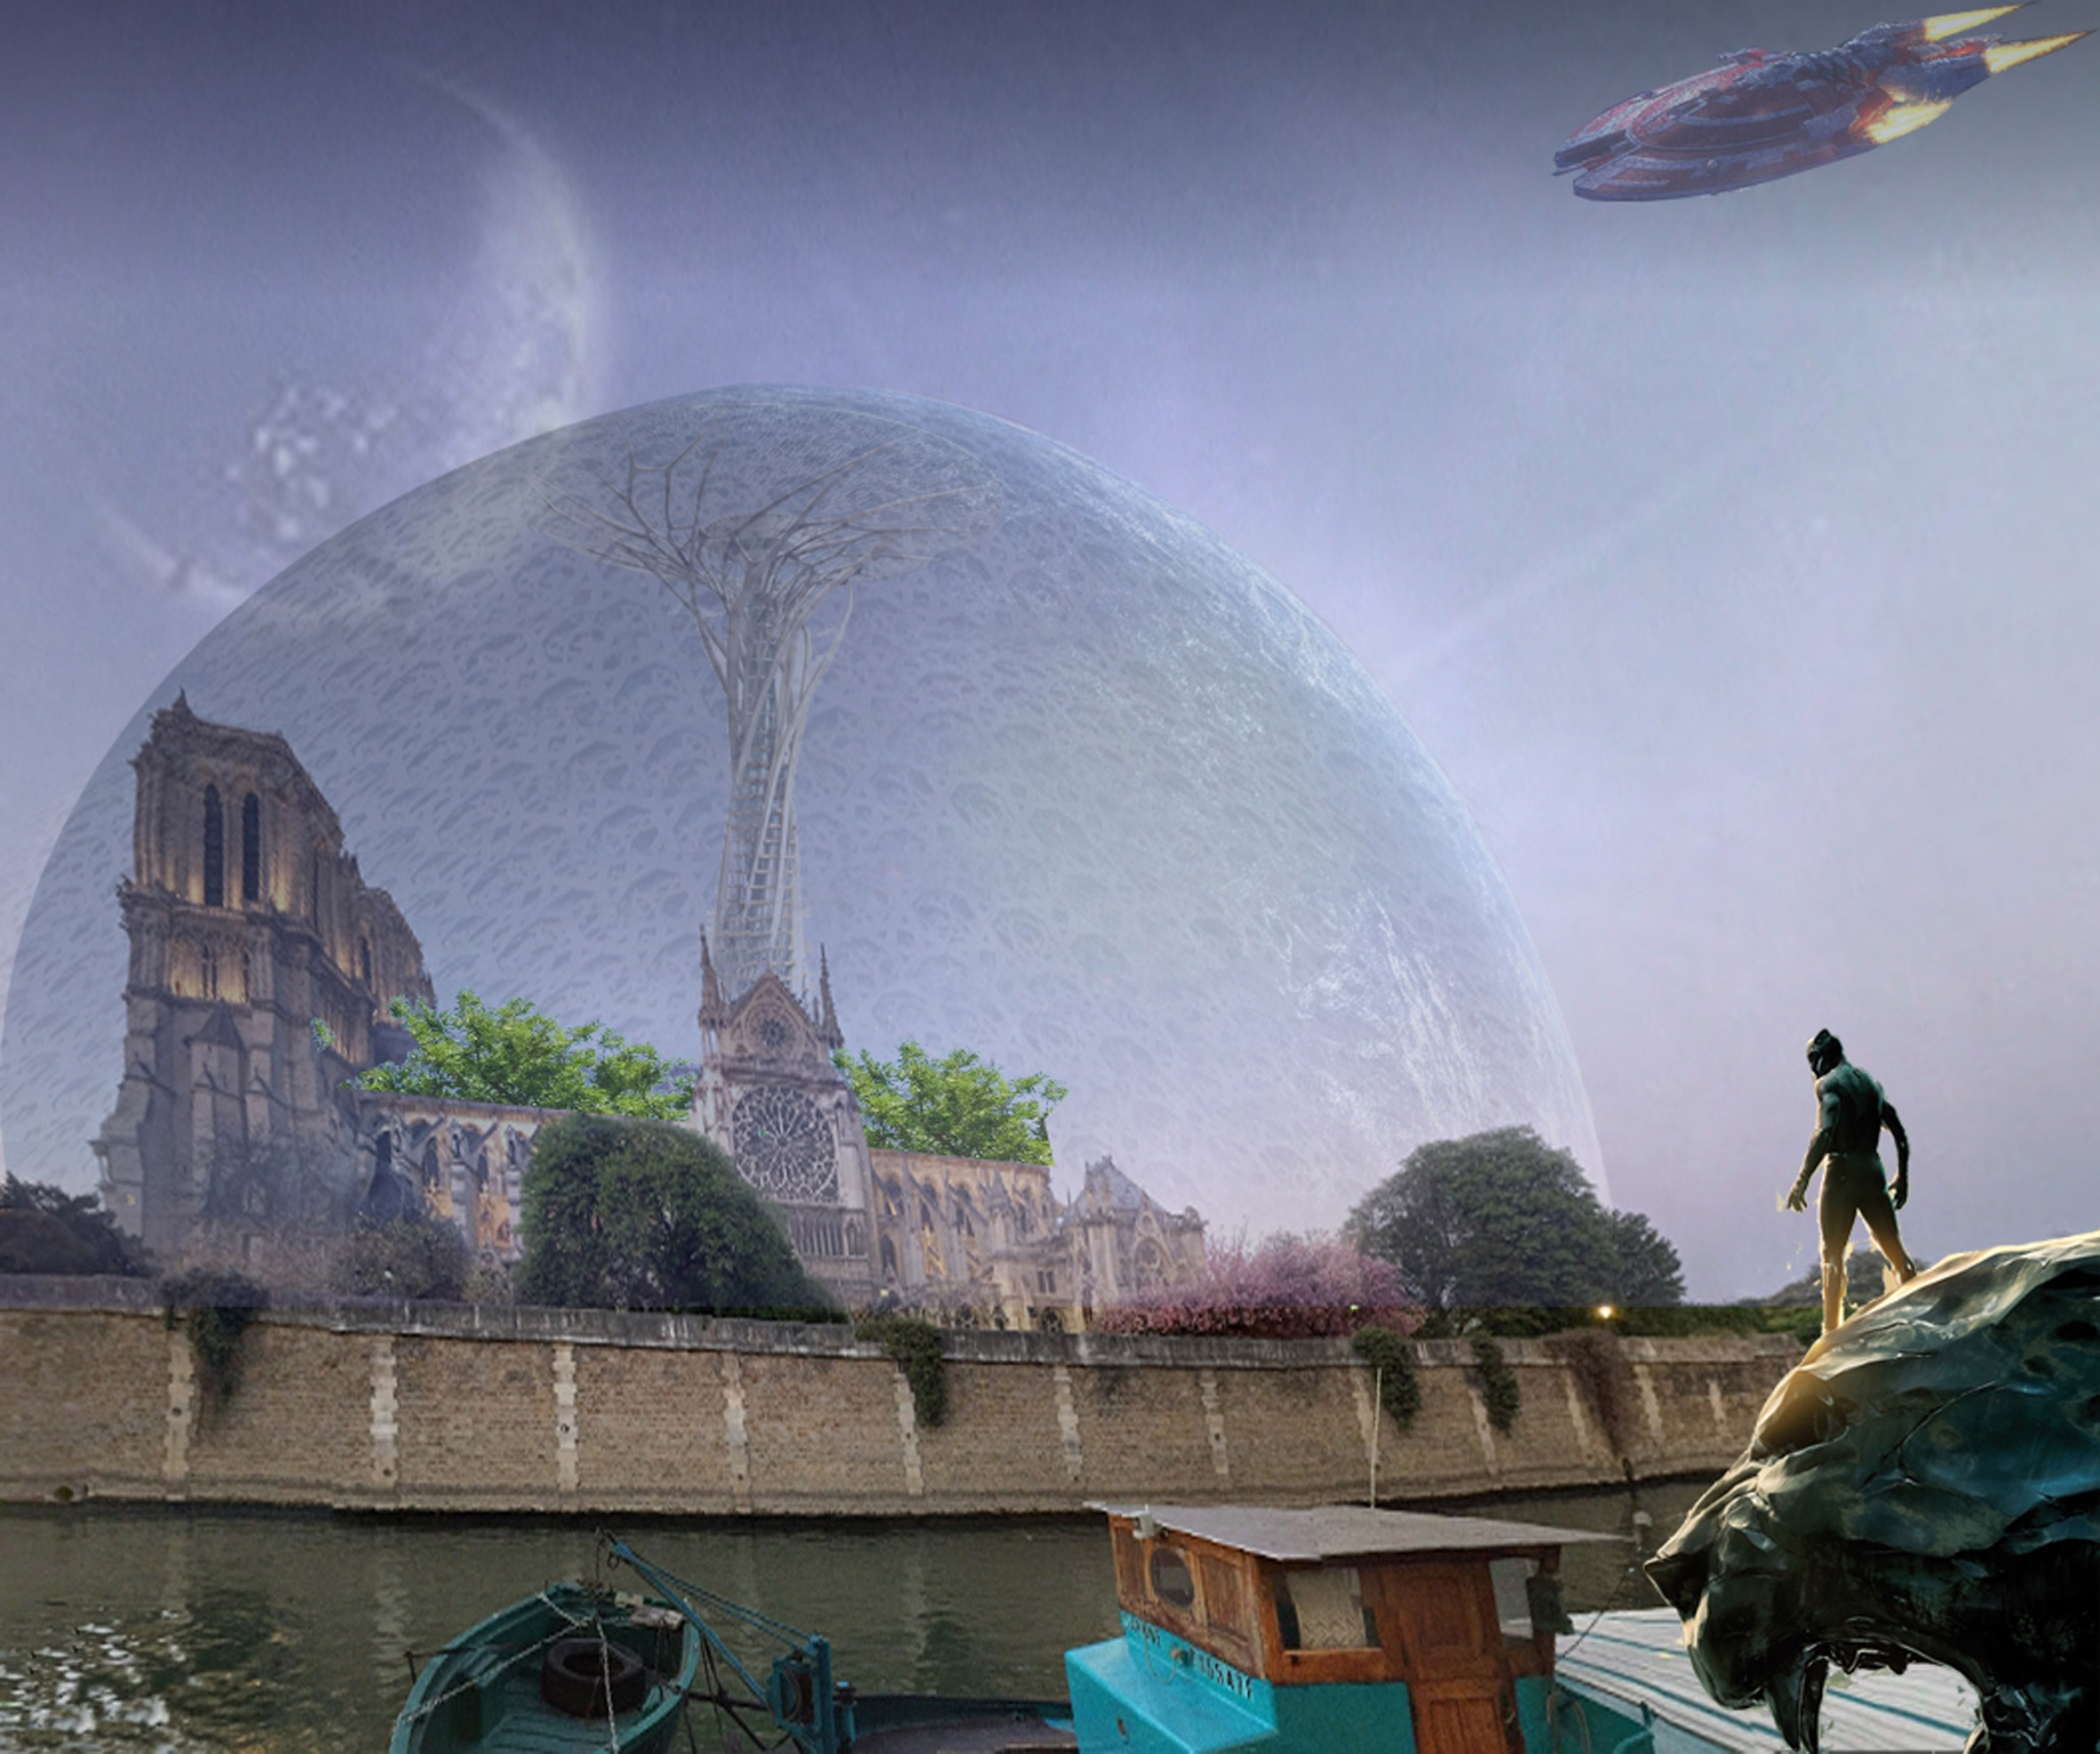 Una burbuja futurista / Bored Panda